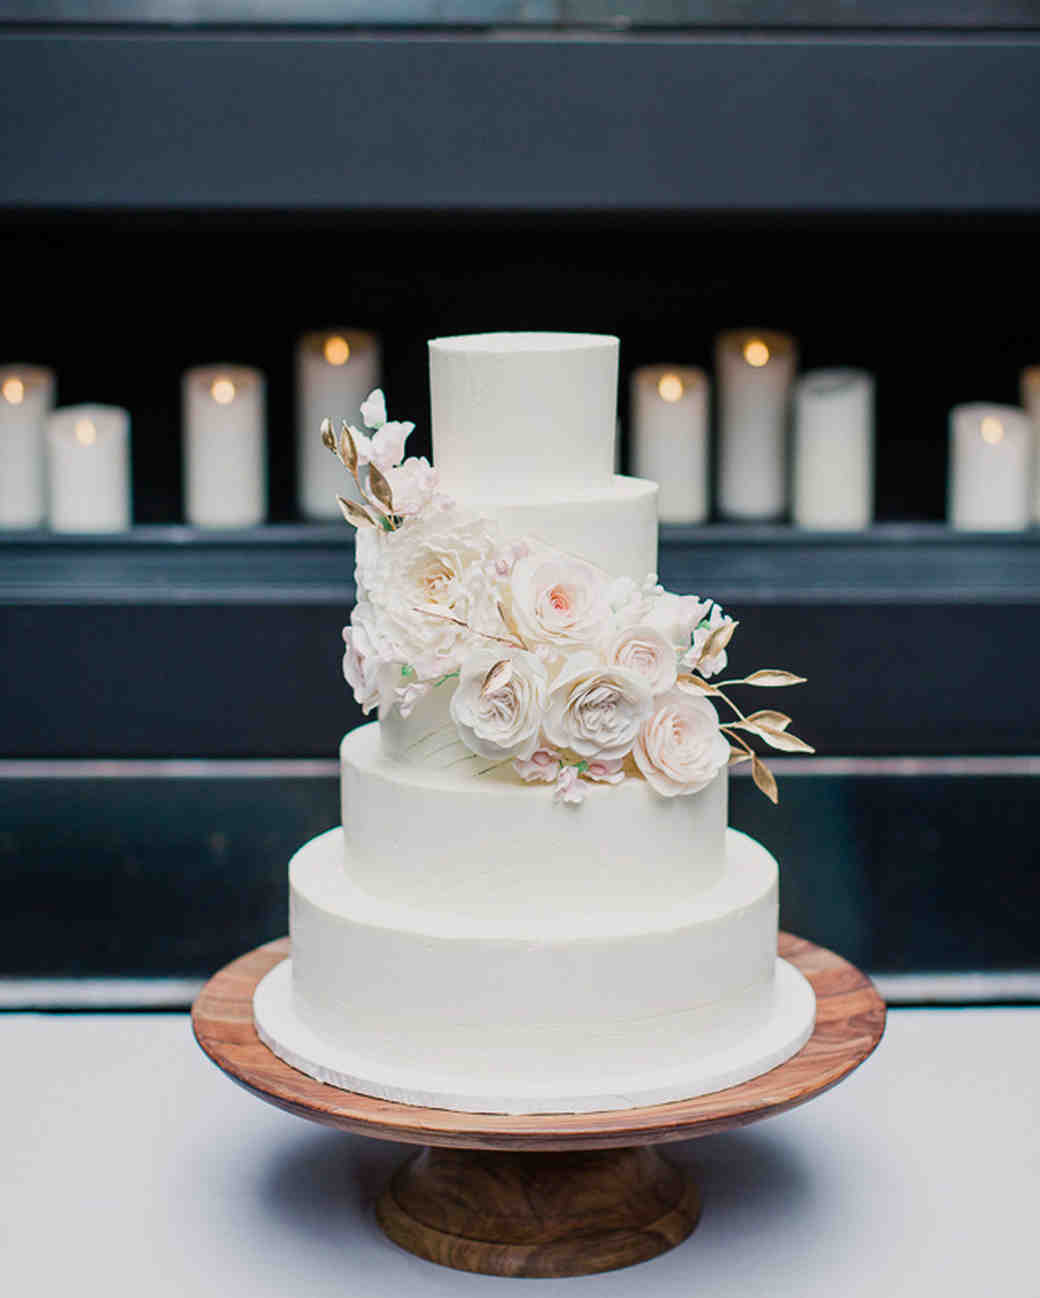 Wedding Cakes Maker  104 White Wedding Cakes That Make the Case for Going